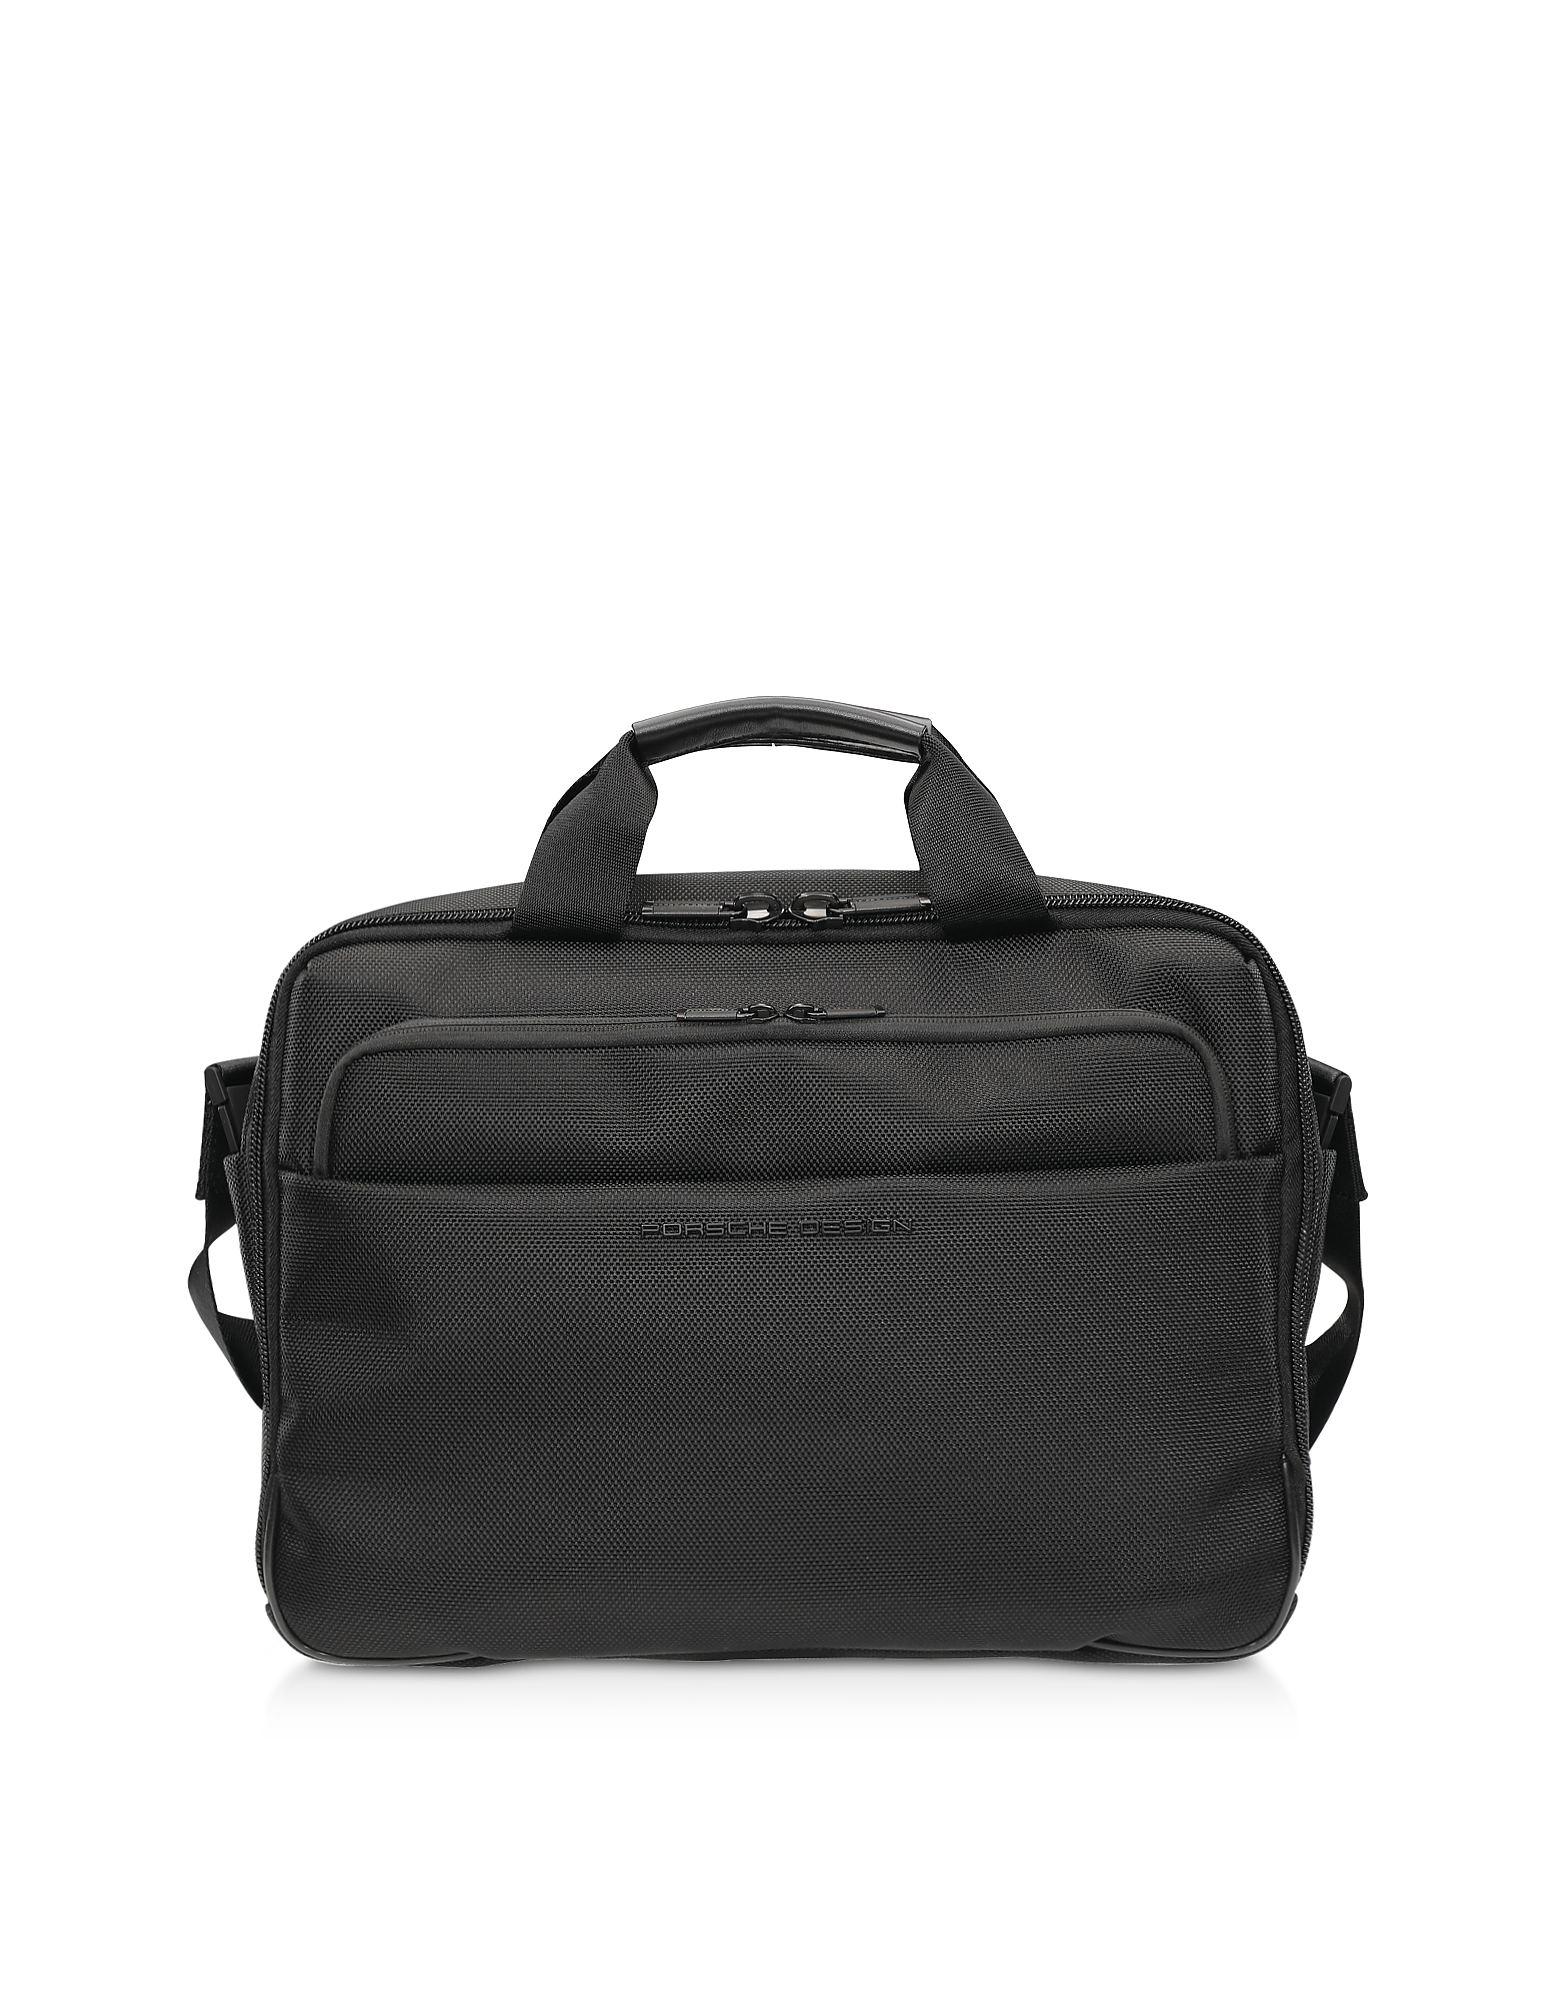 Roadster 4.0 SHZ Briefbag, Black